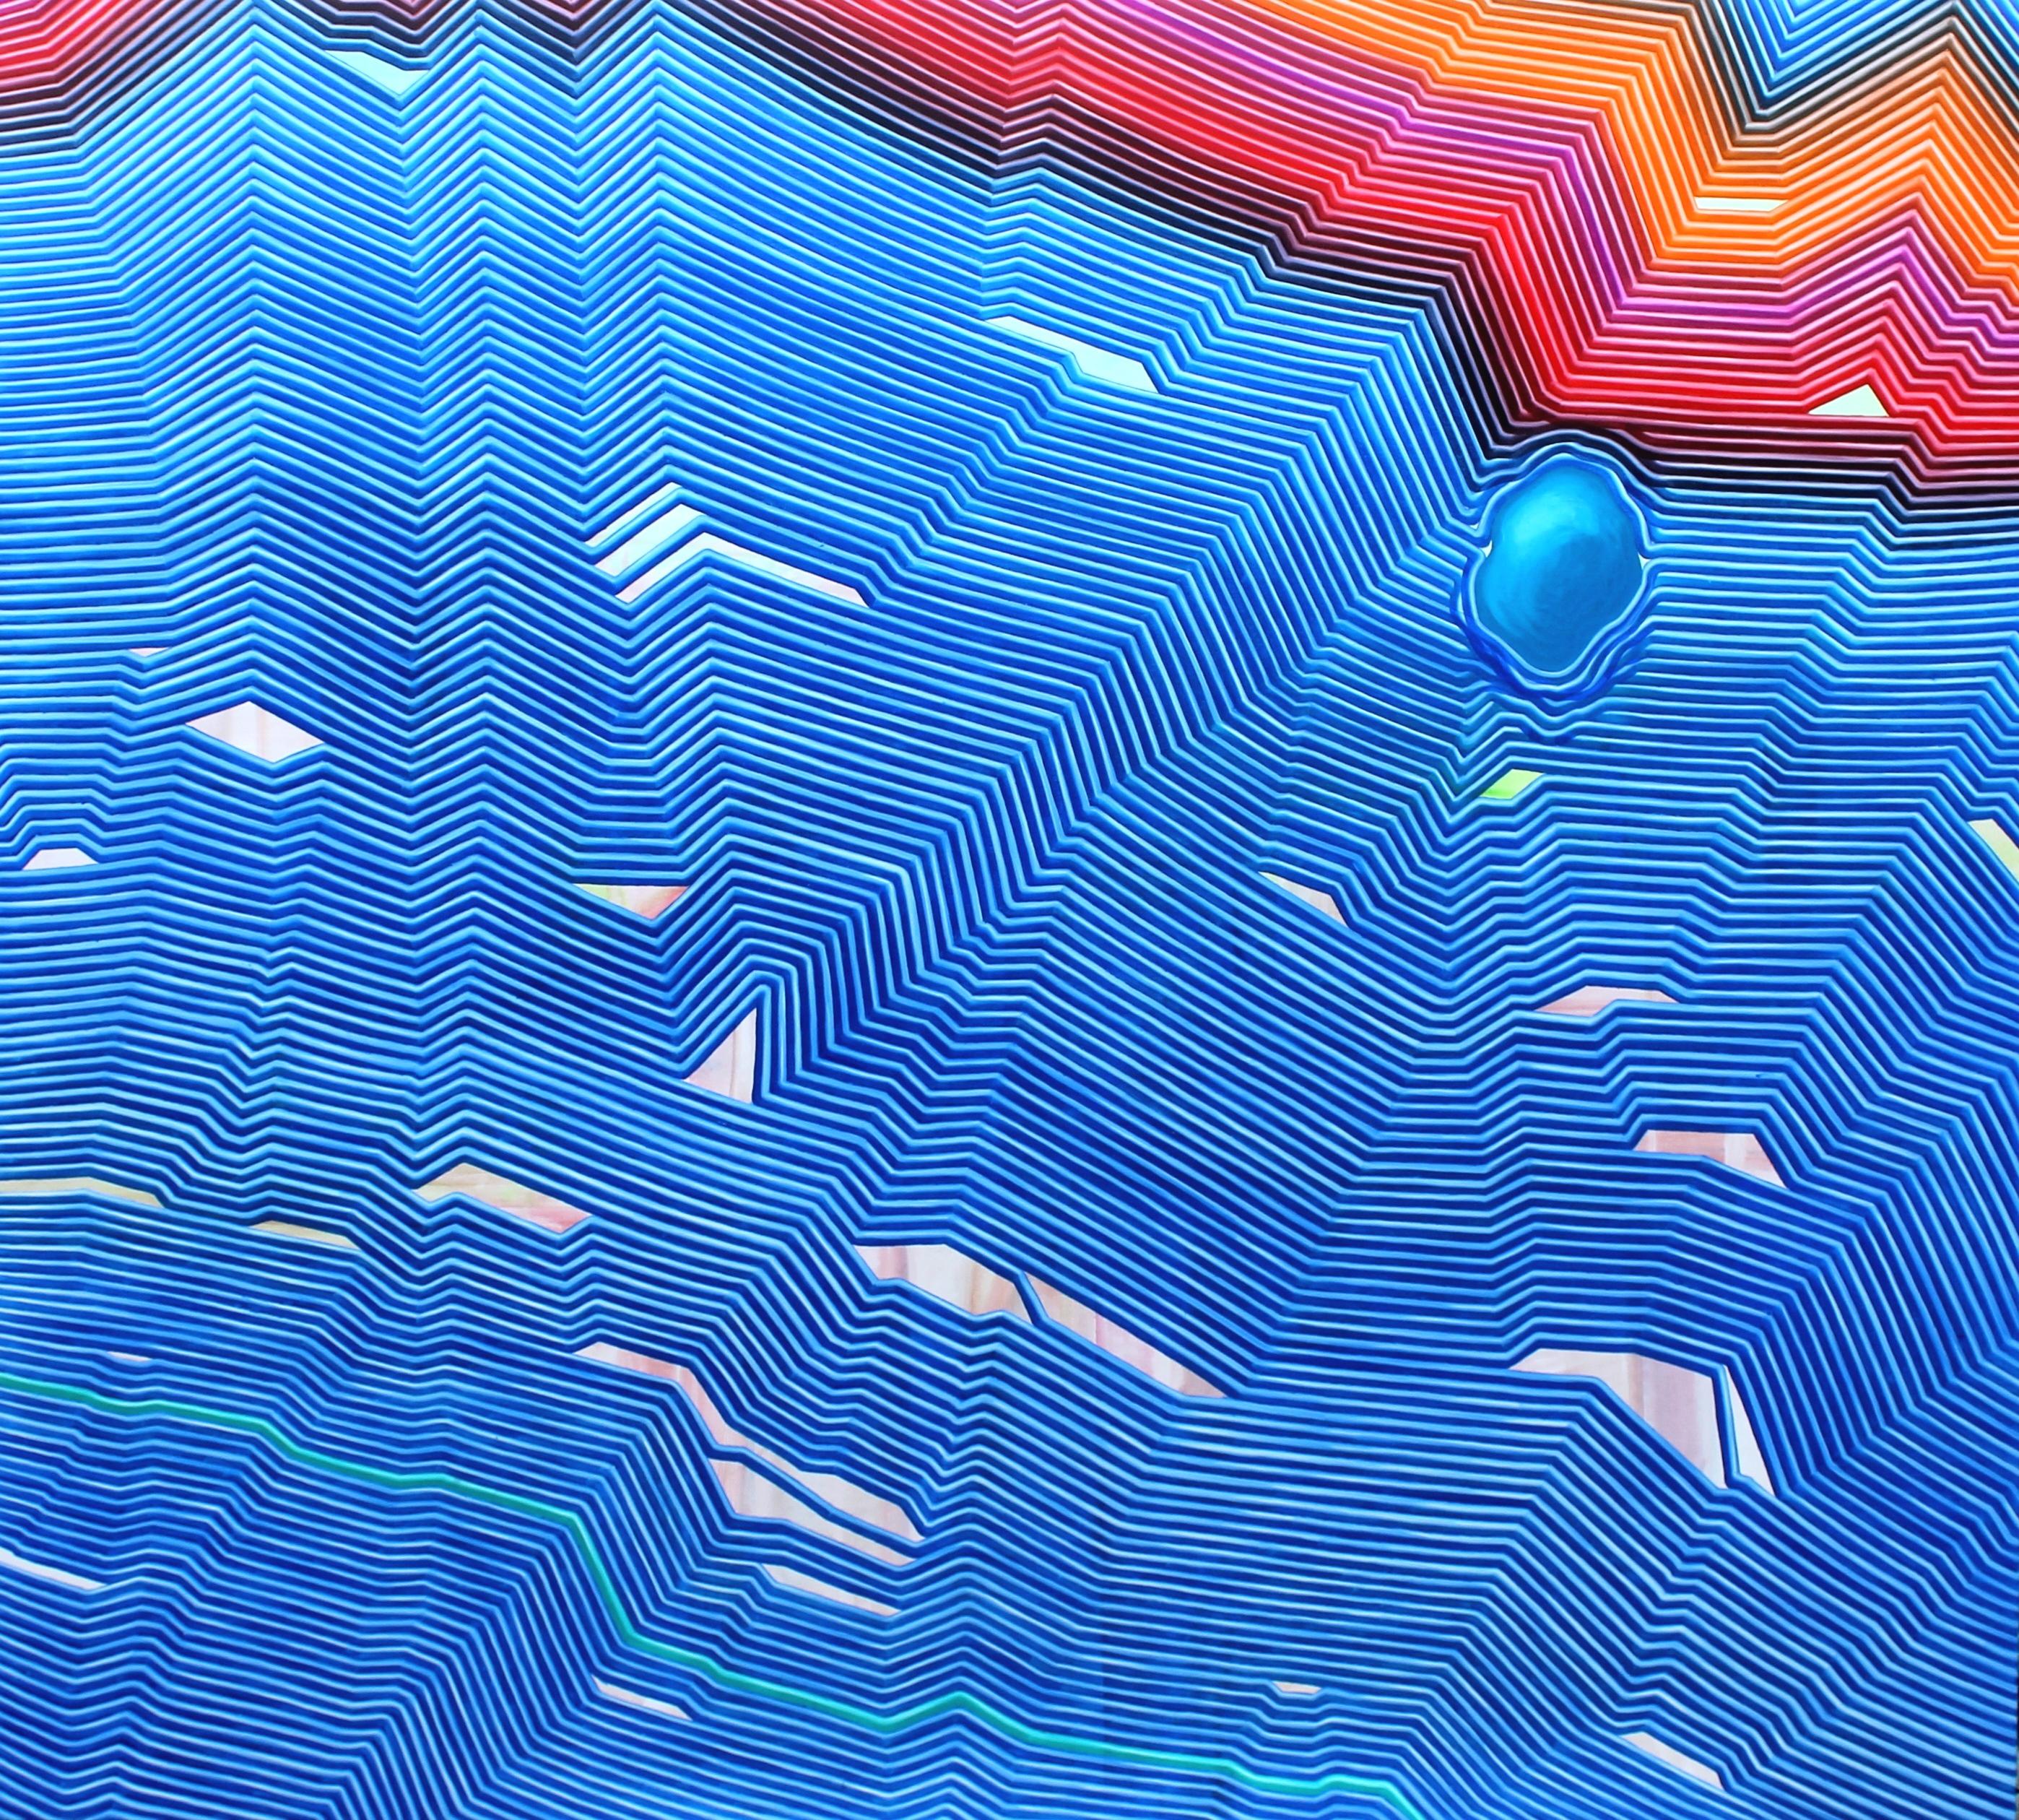 Full Blue, acrilyc and oil on canavas, 210x180cm, 2018